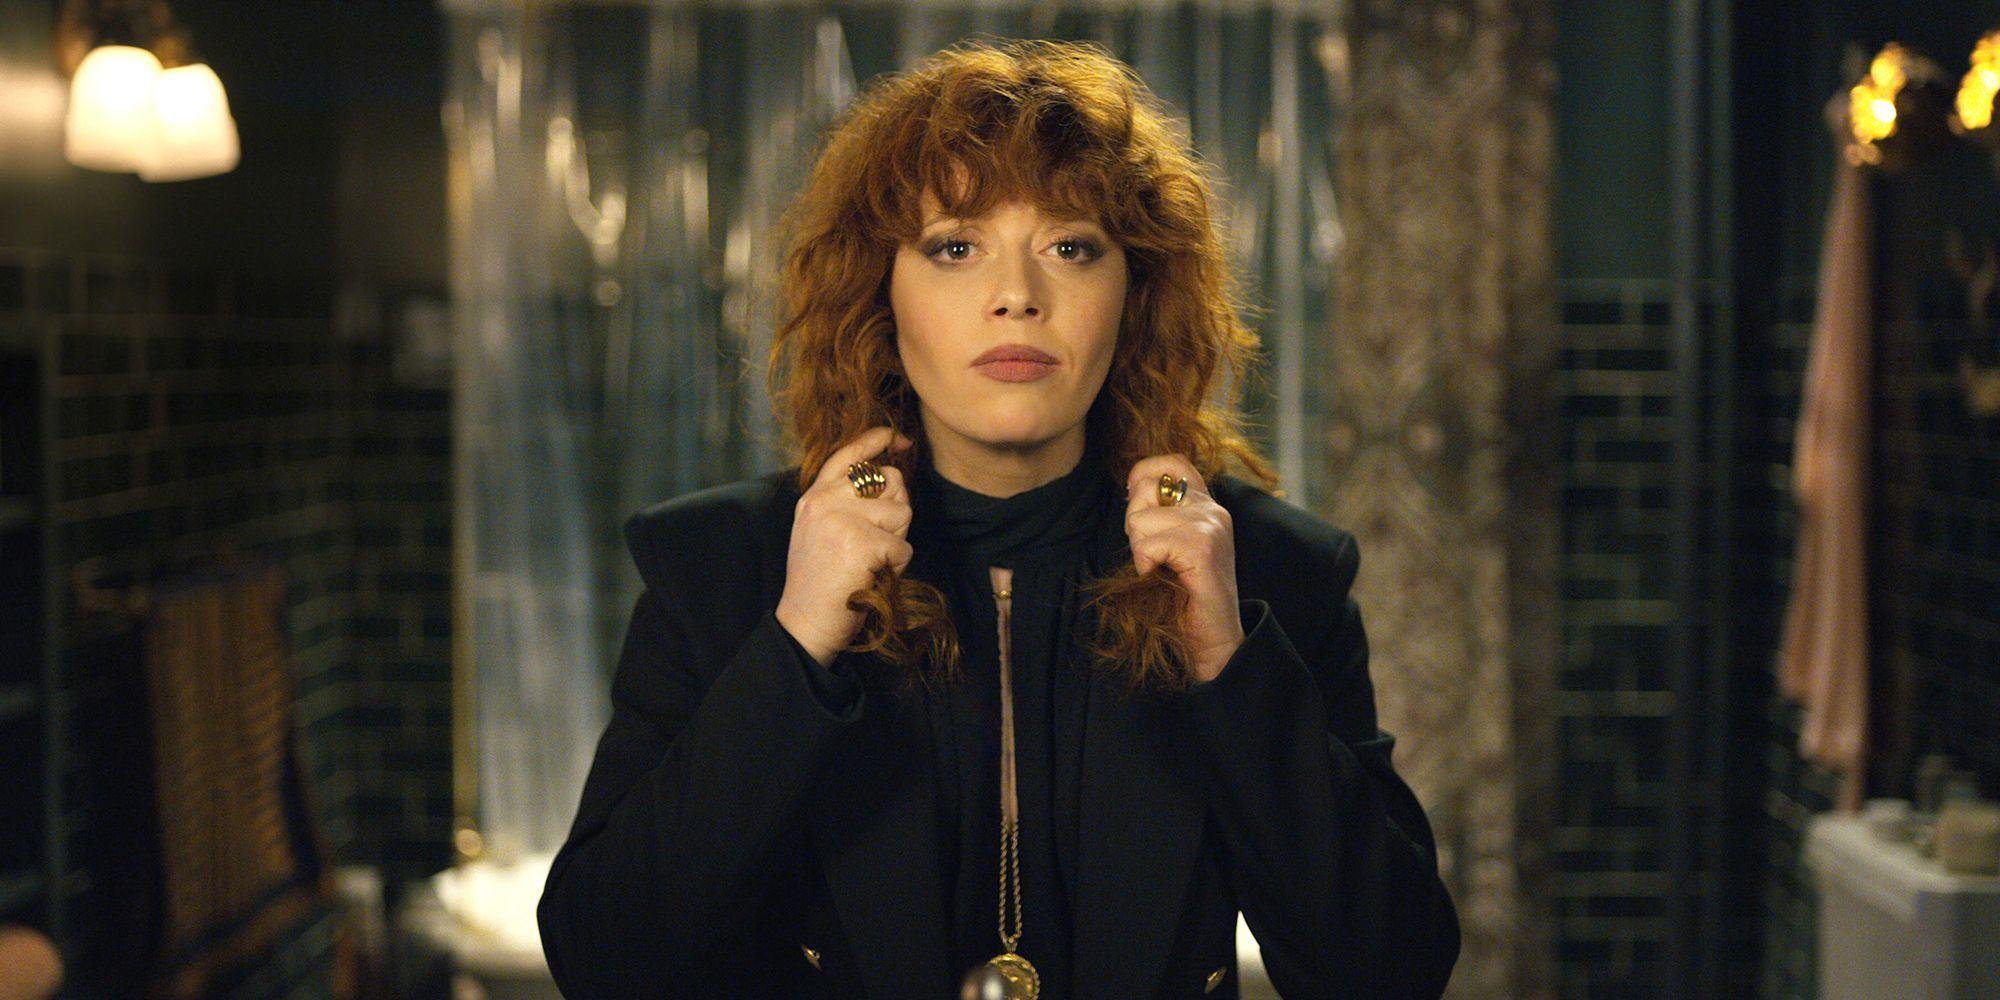 Natasha Lyonne inRussian Doll